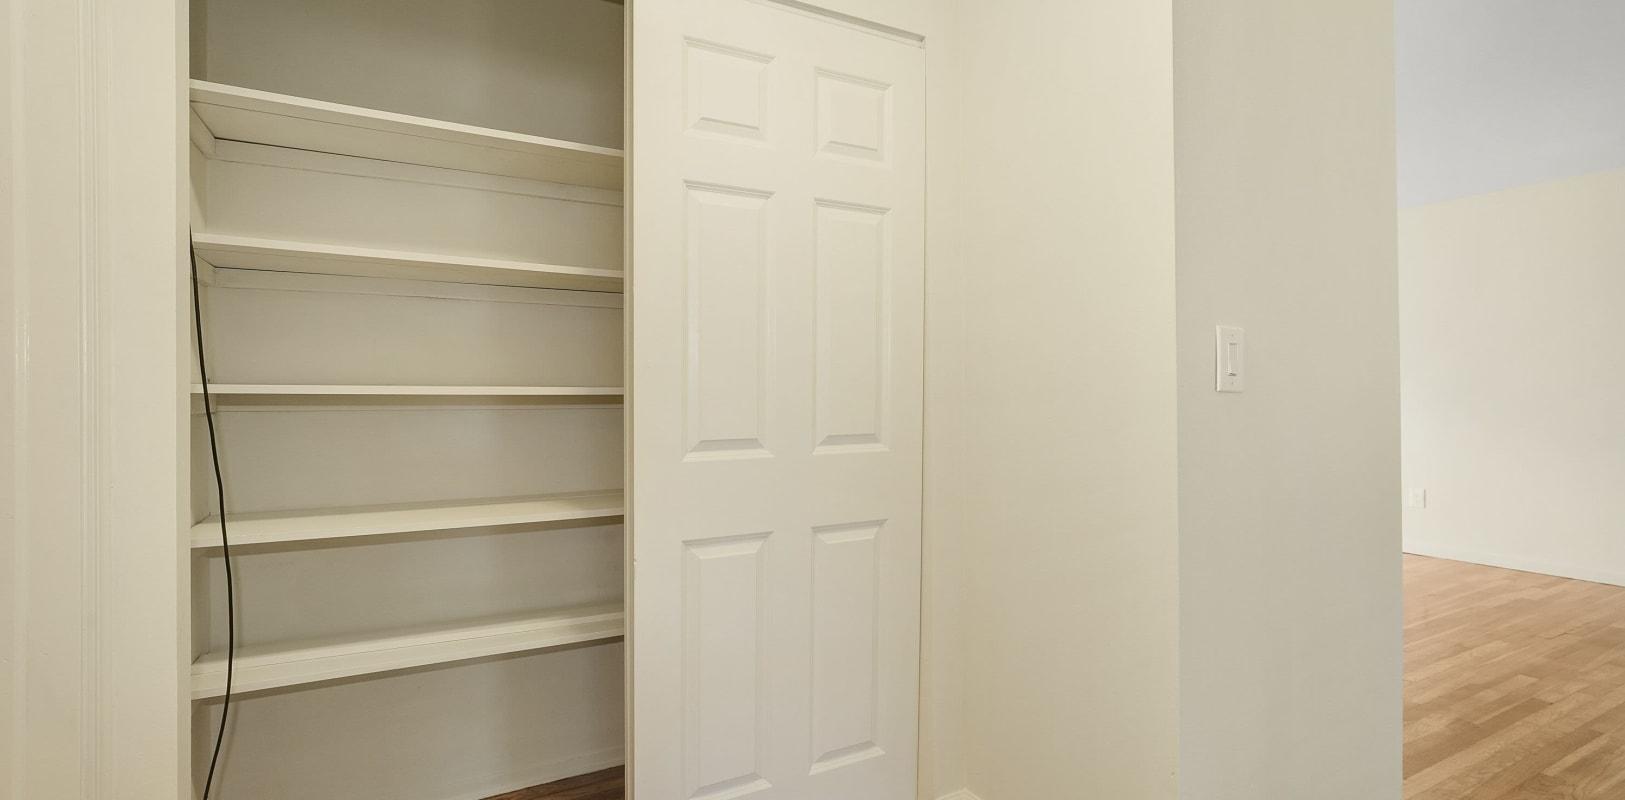 Hallway closet at Balmoral Arms in Matawan, New Jersey